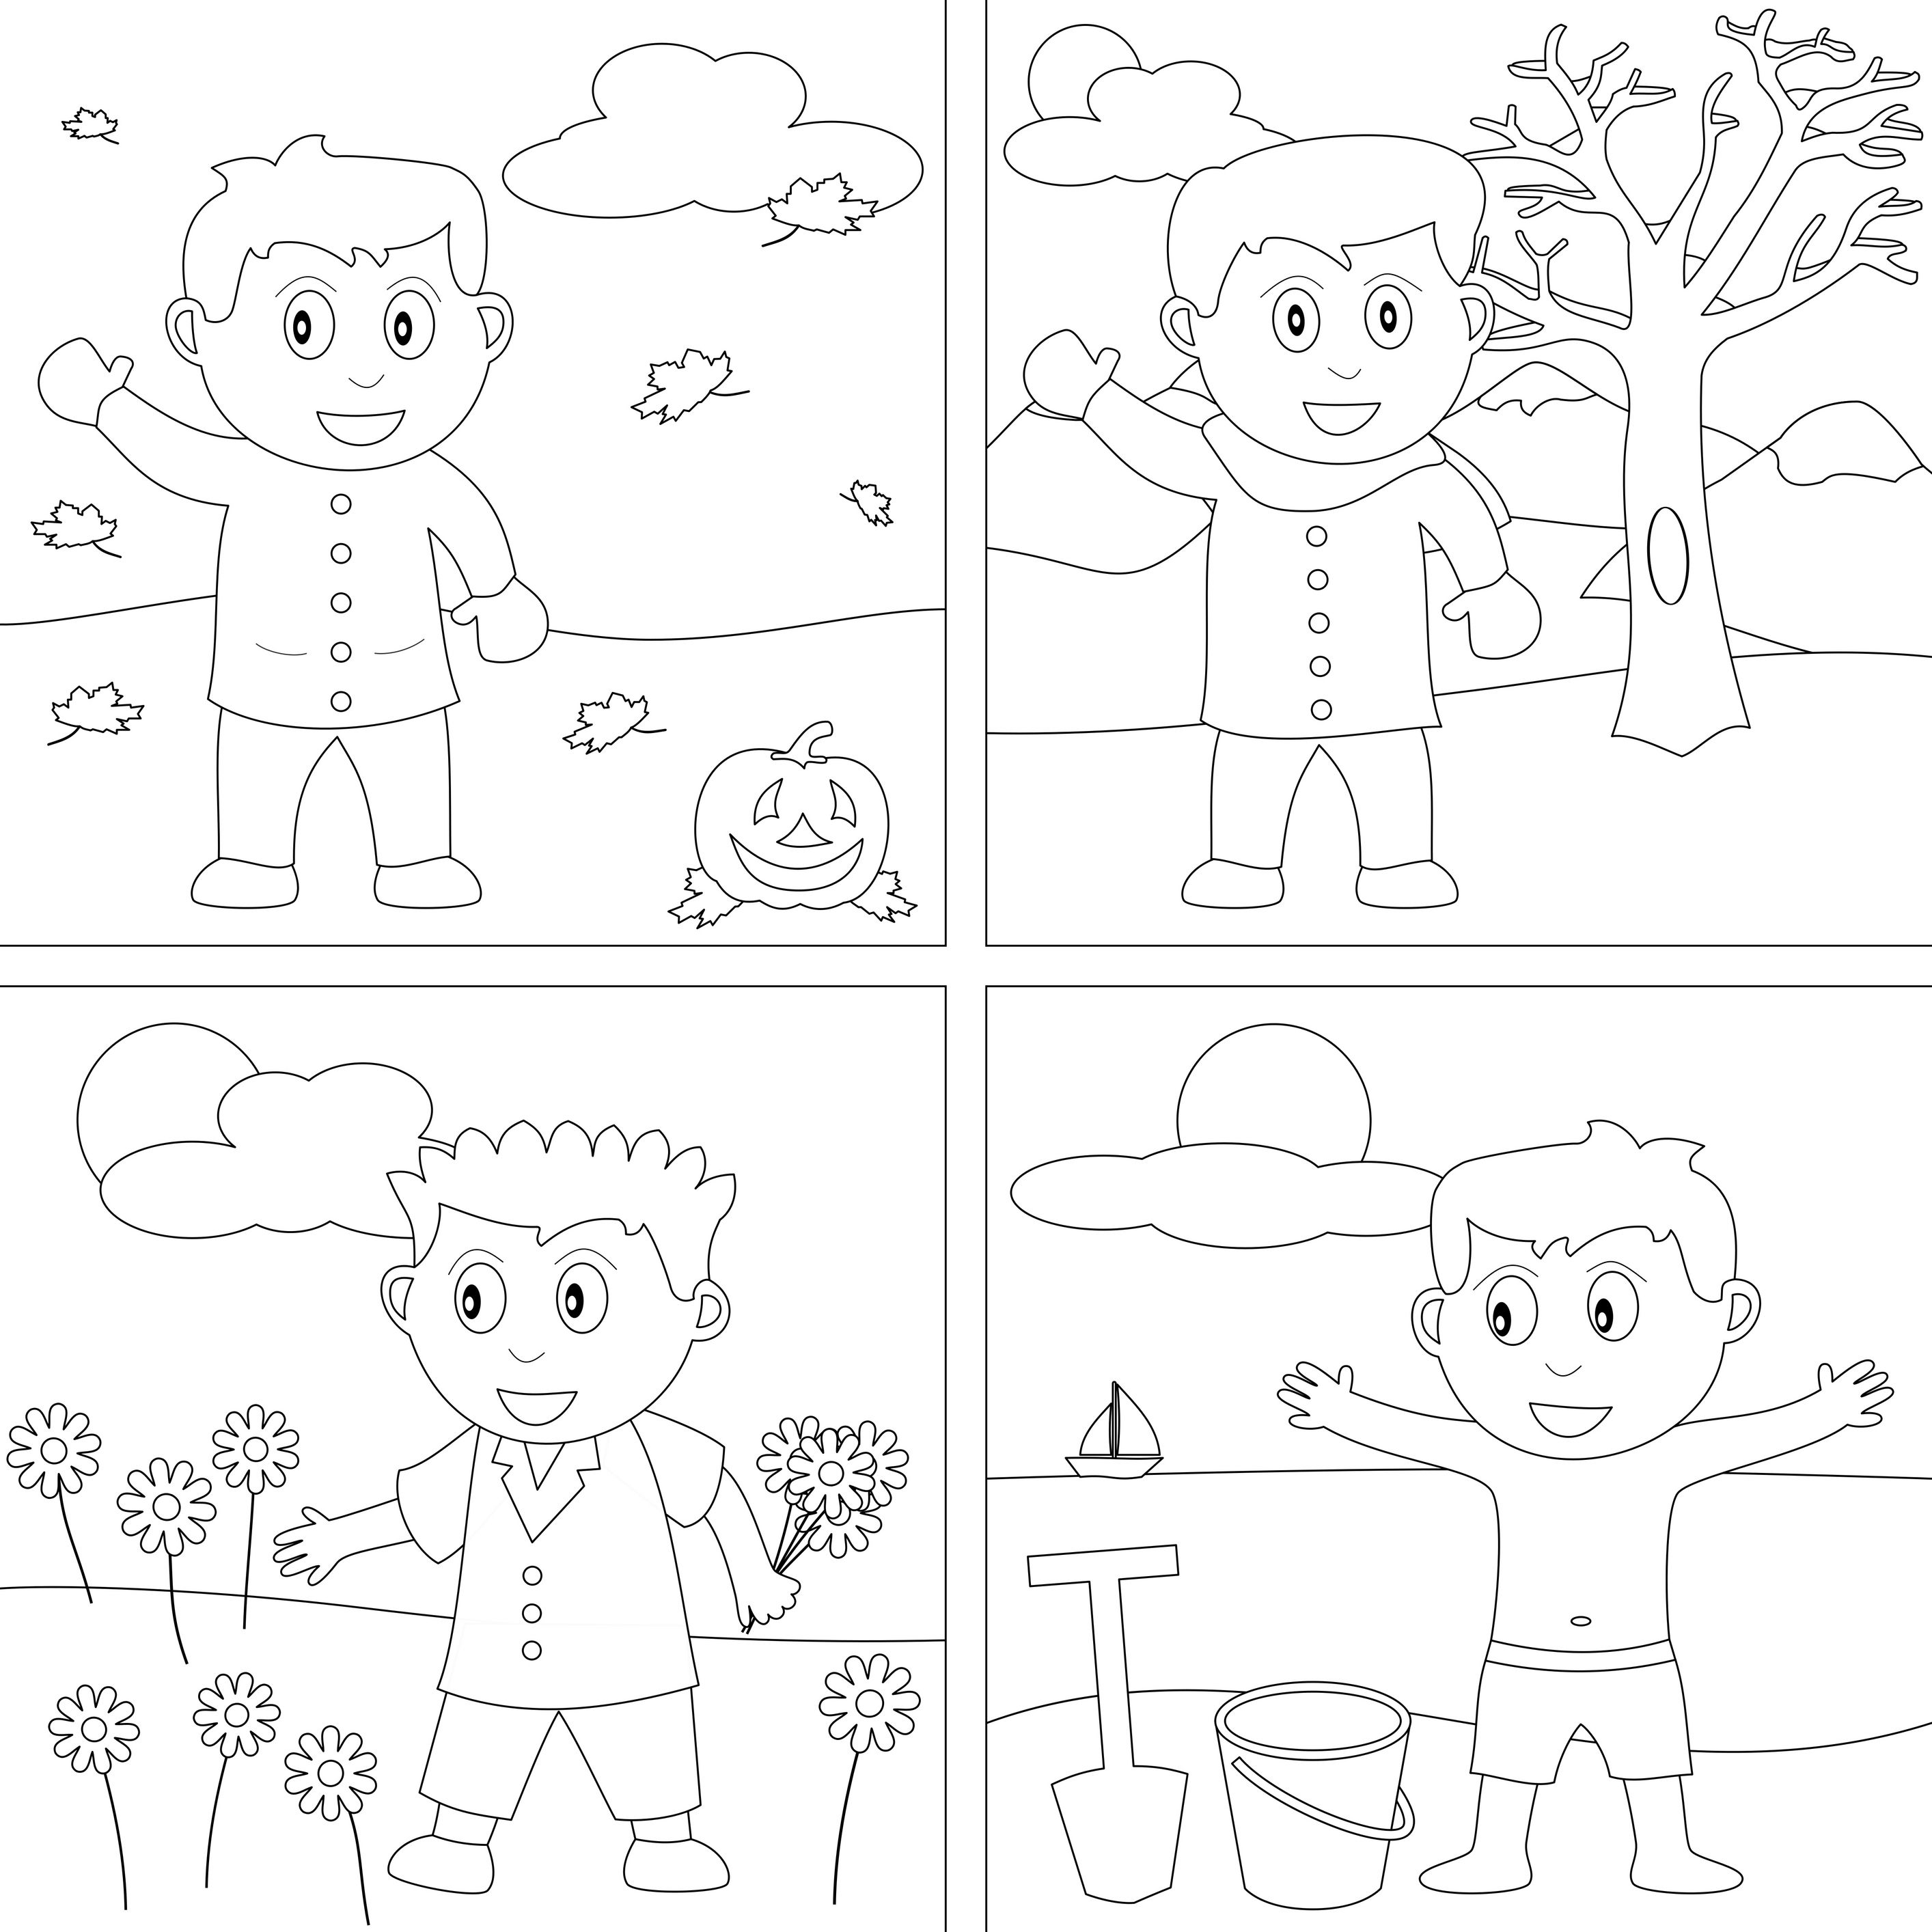 worksheet Seasons Worksheet 17 best images about seasons on pinterest spring preschool and of the year